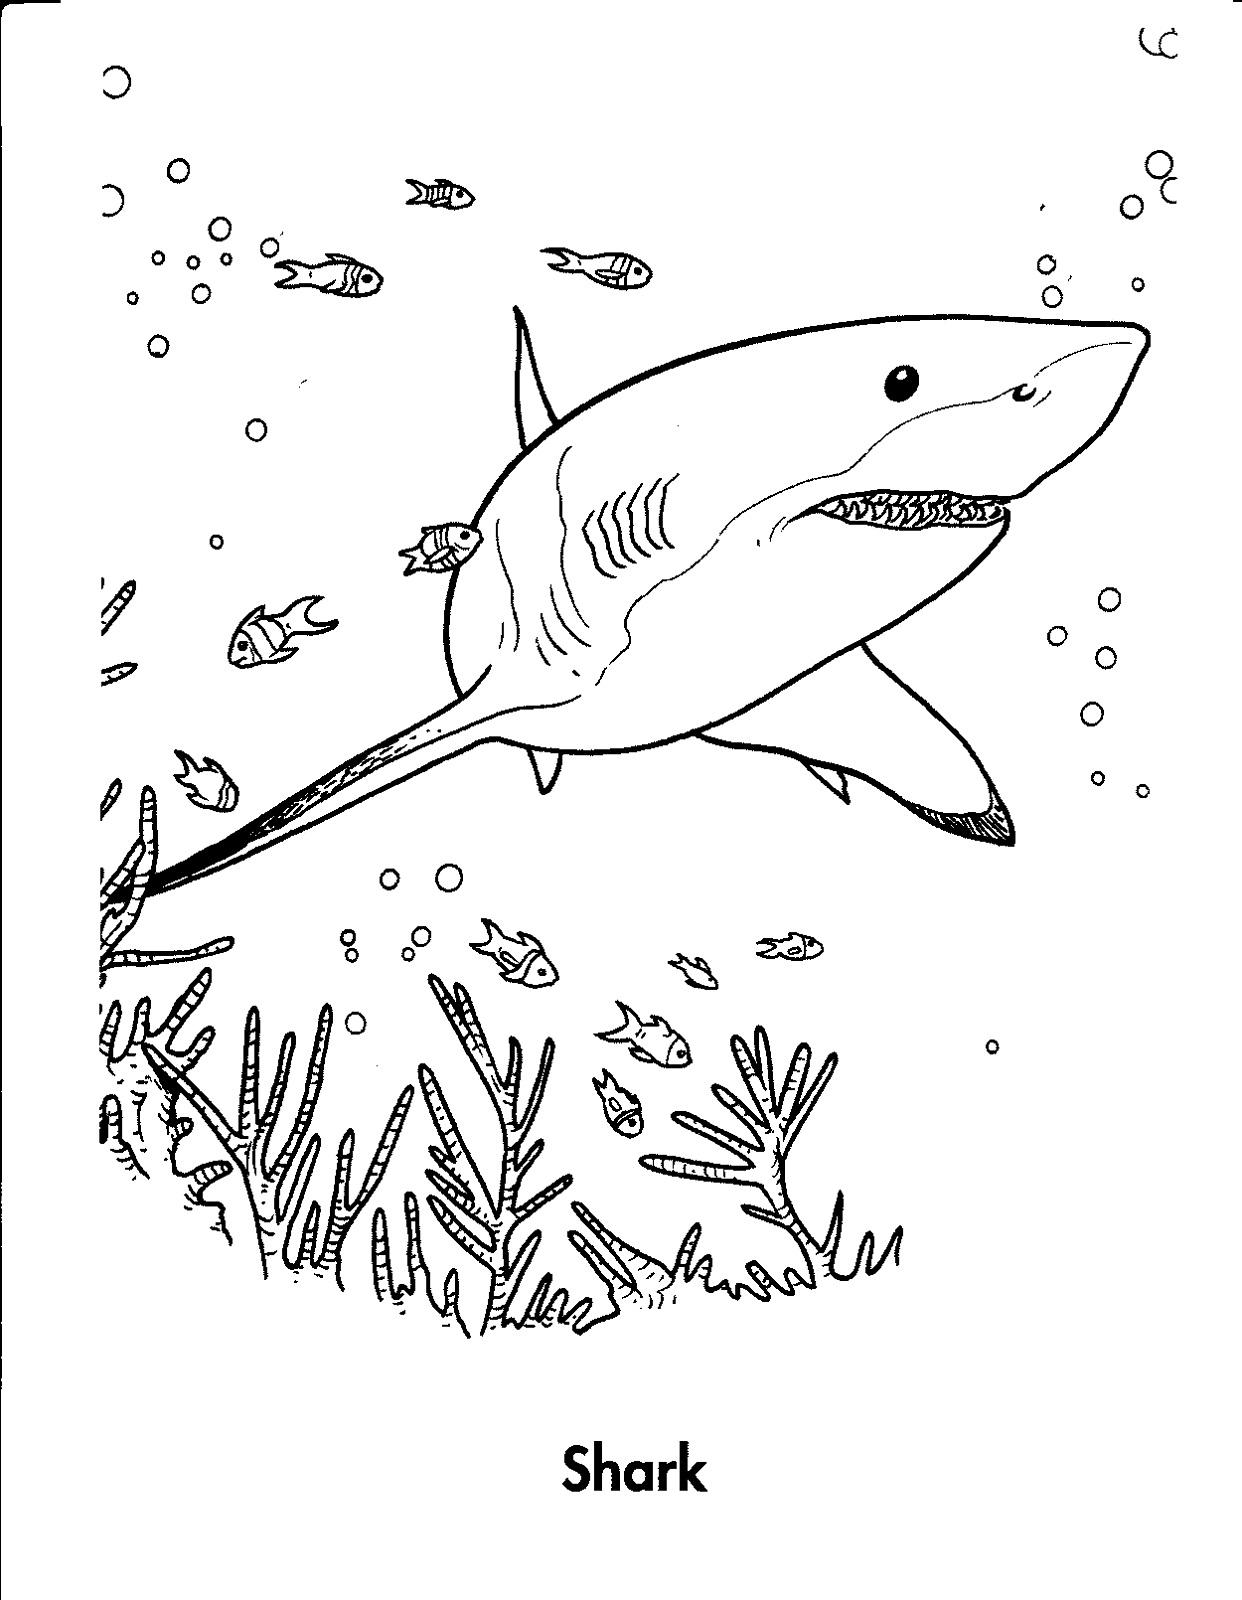 Shark Sheets for Kids  Activity Shelter